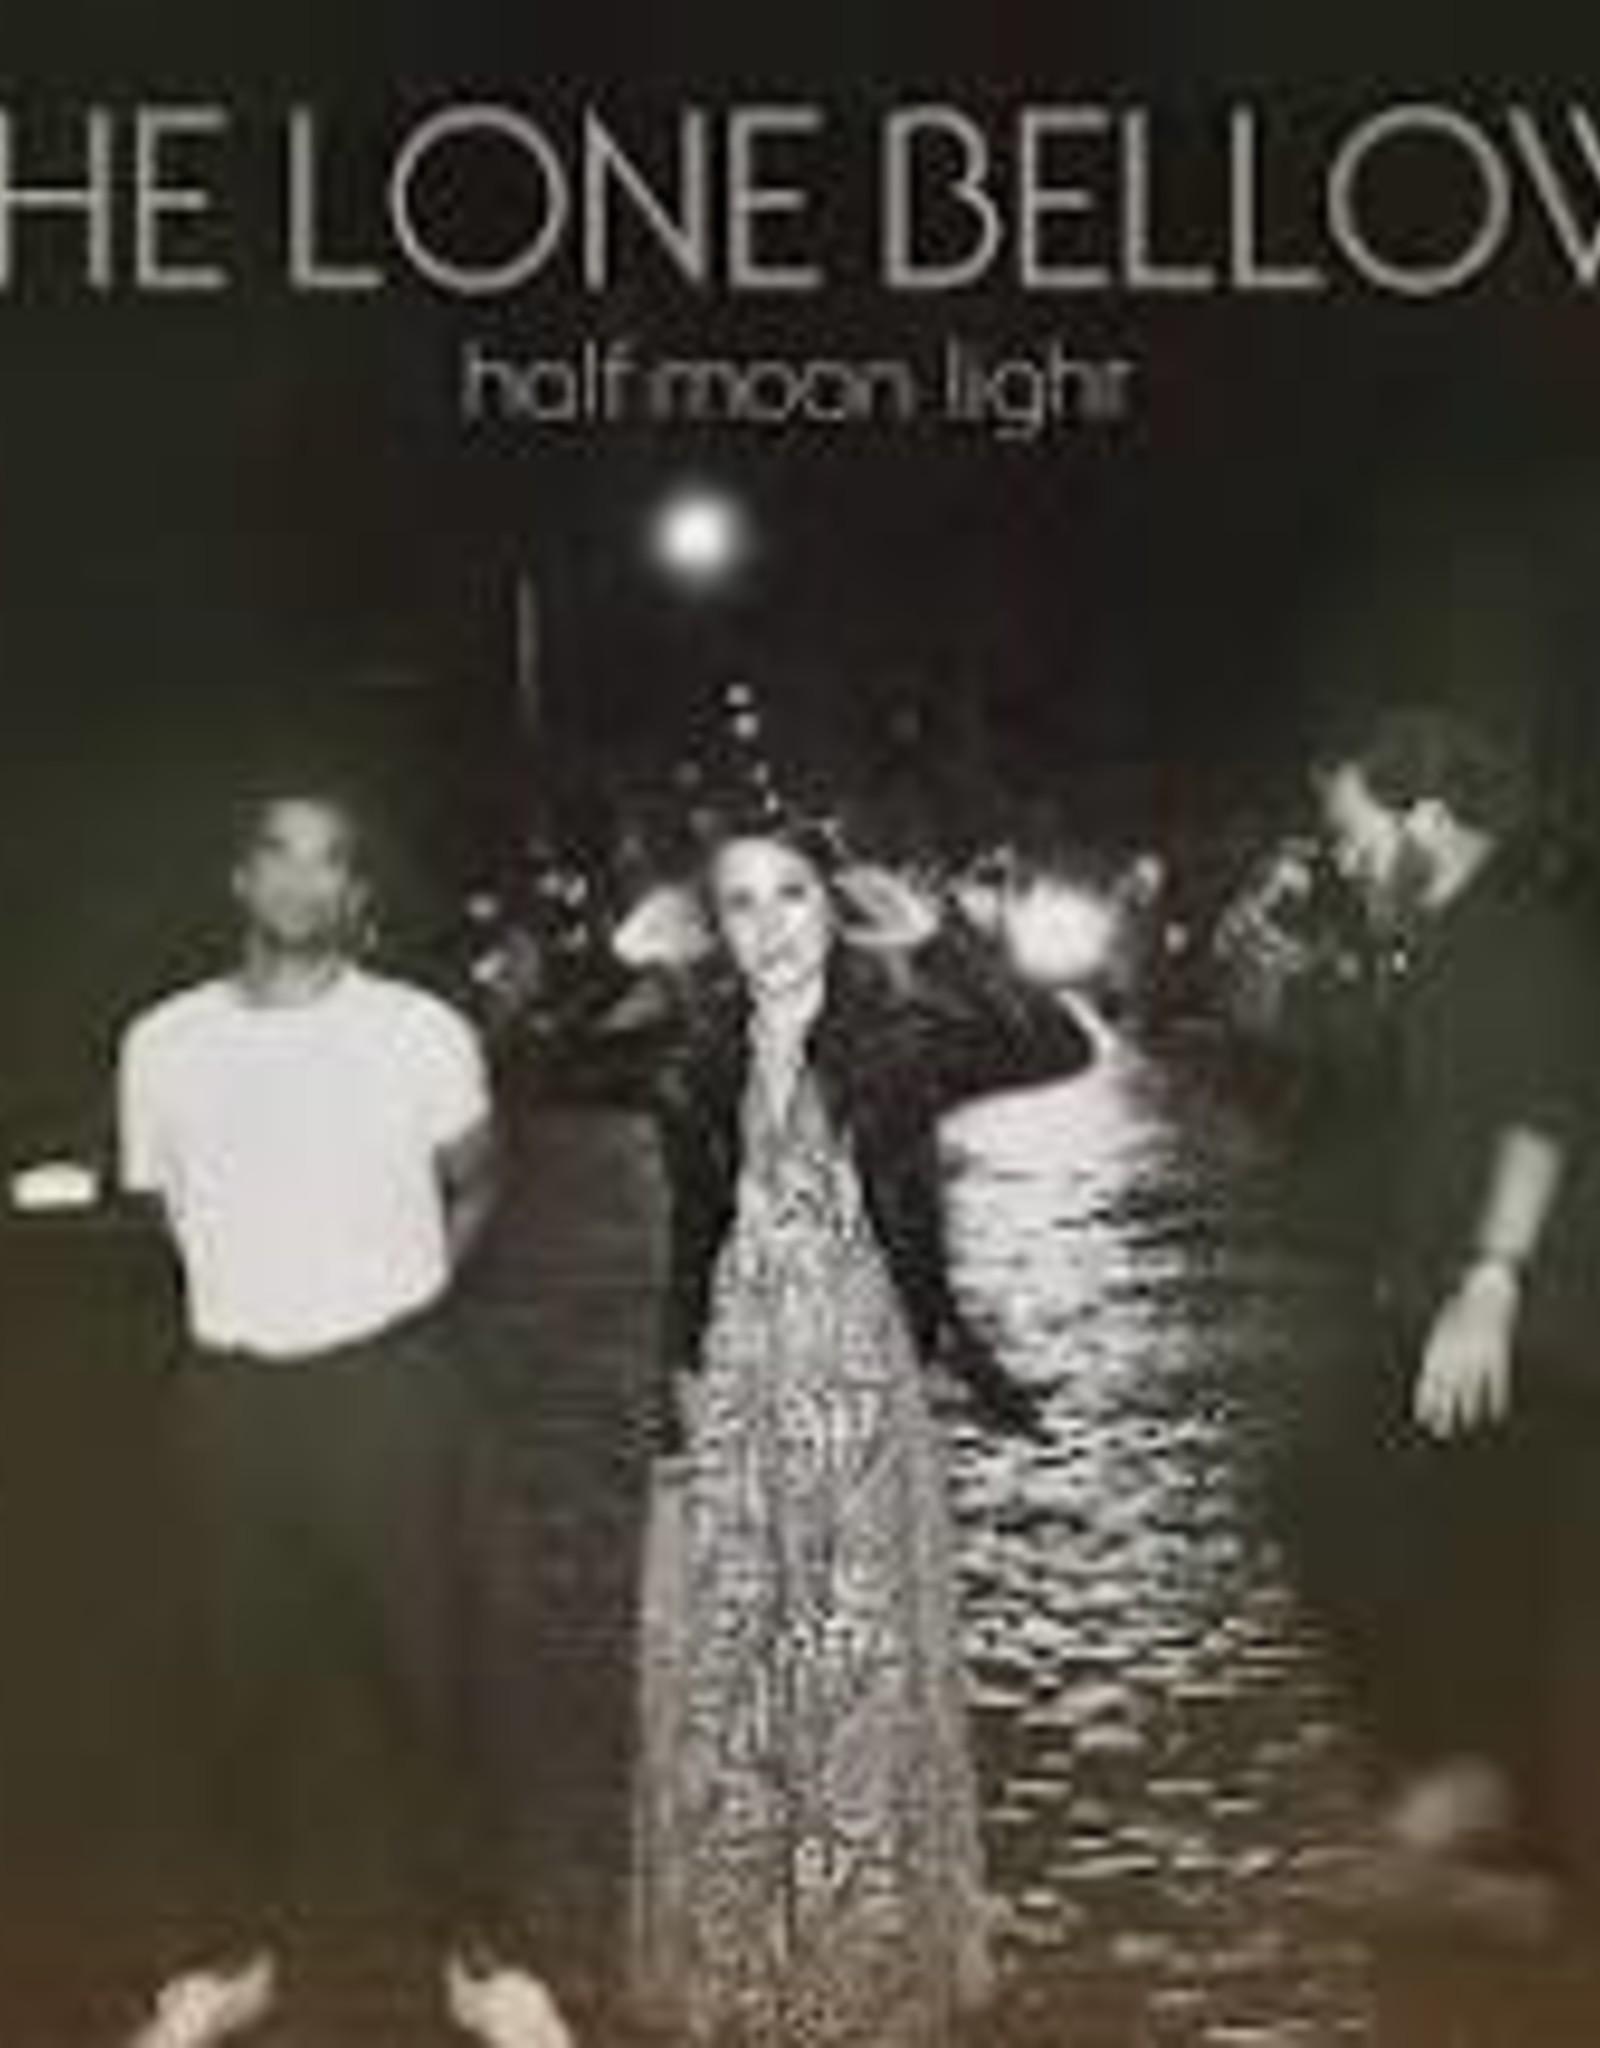 The Lone Bellow - Half Moon Light